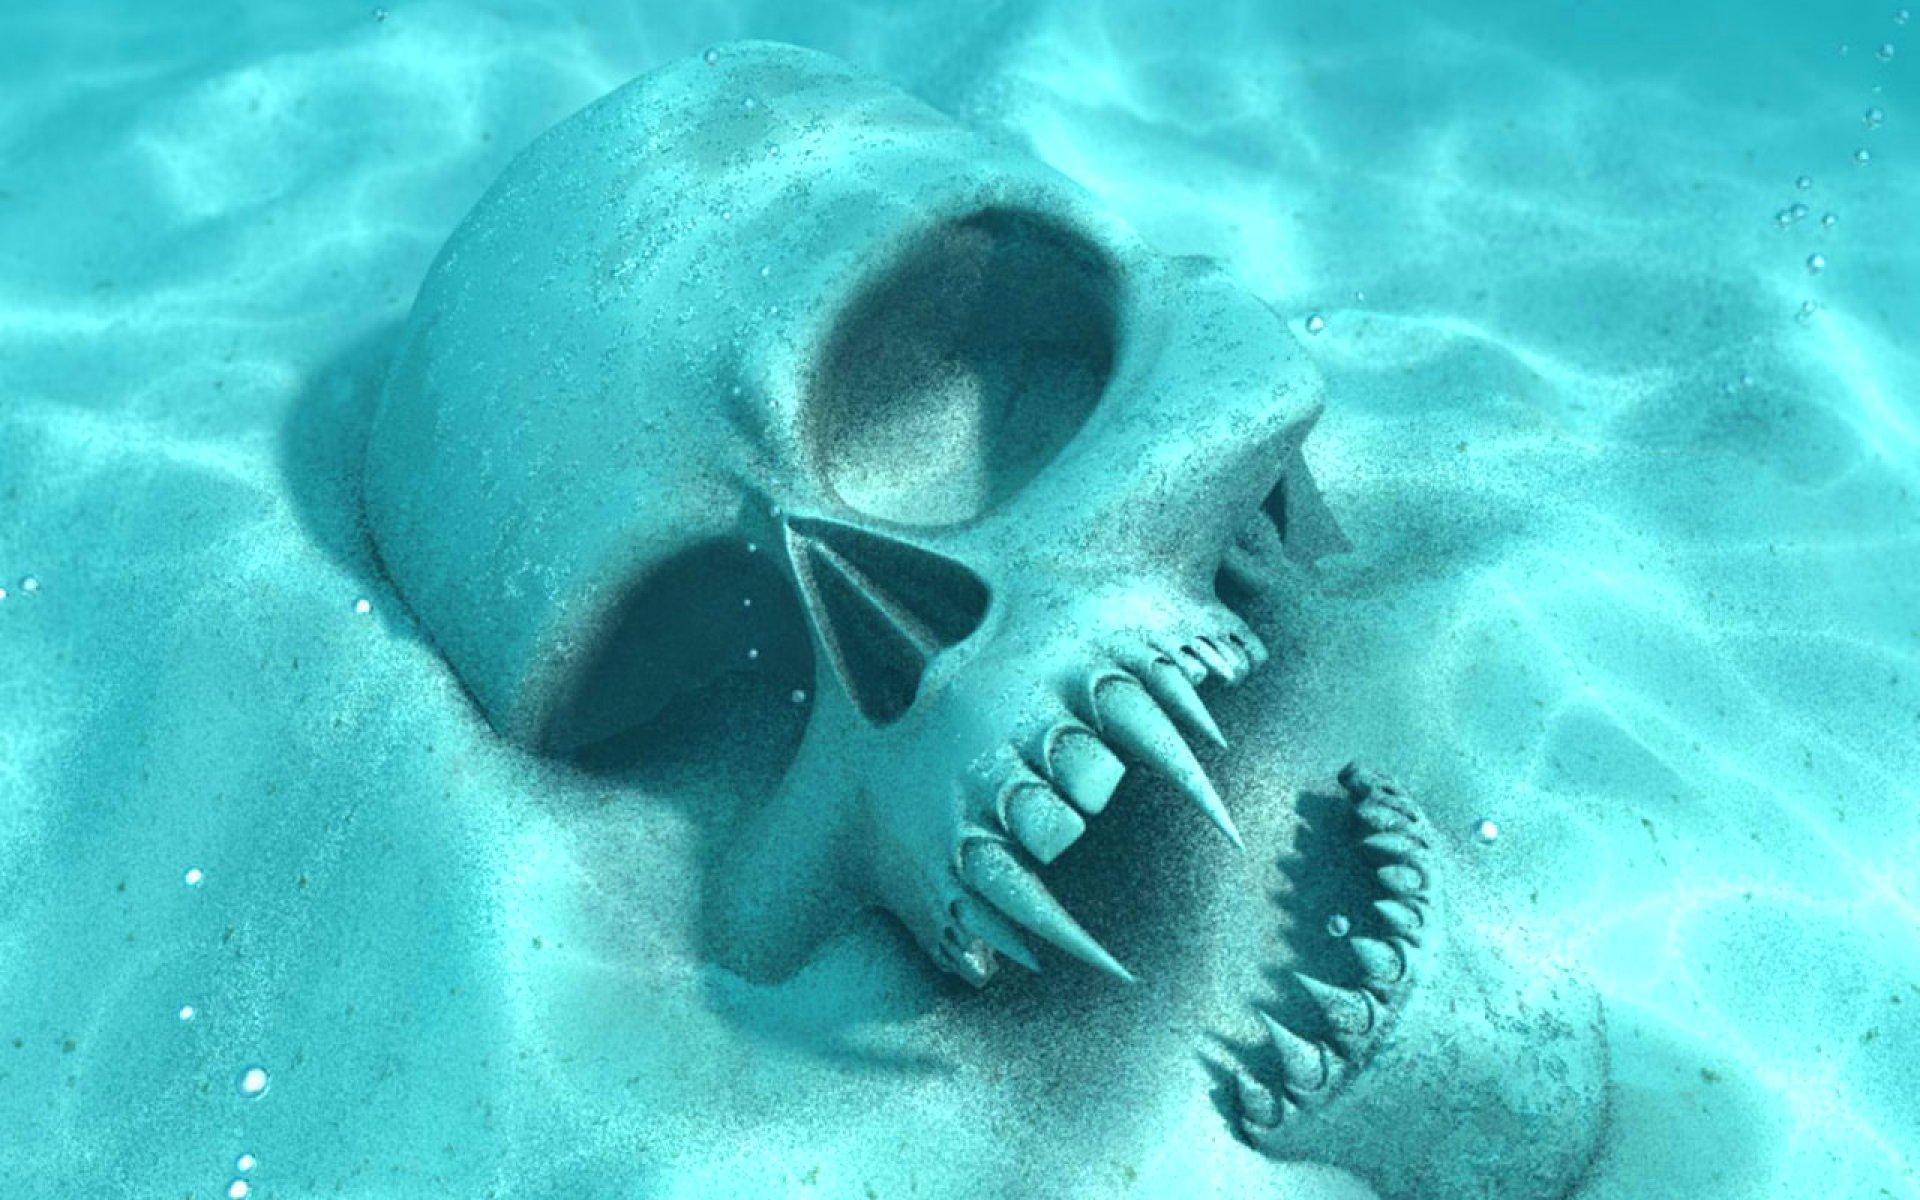 картинки море скелеты правила просты